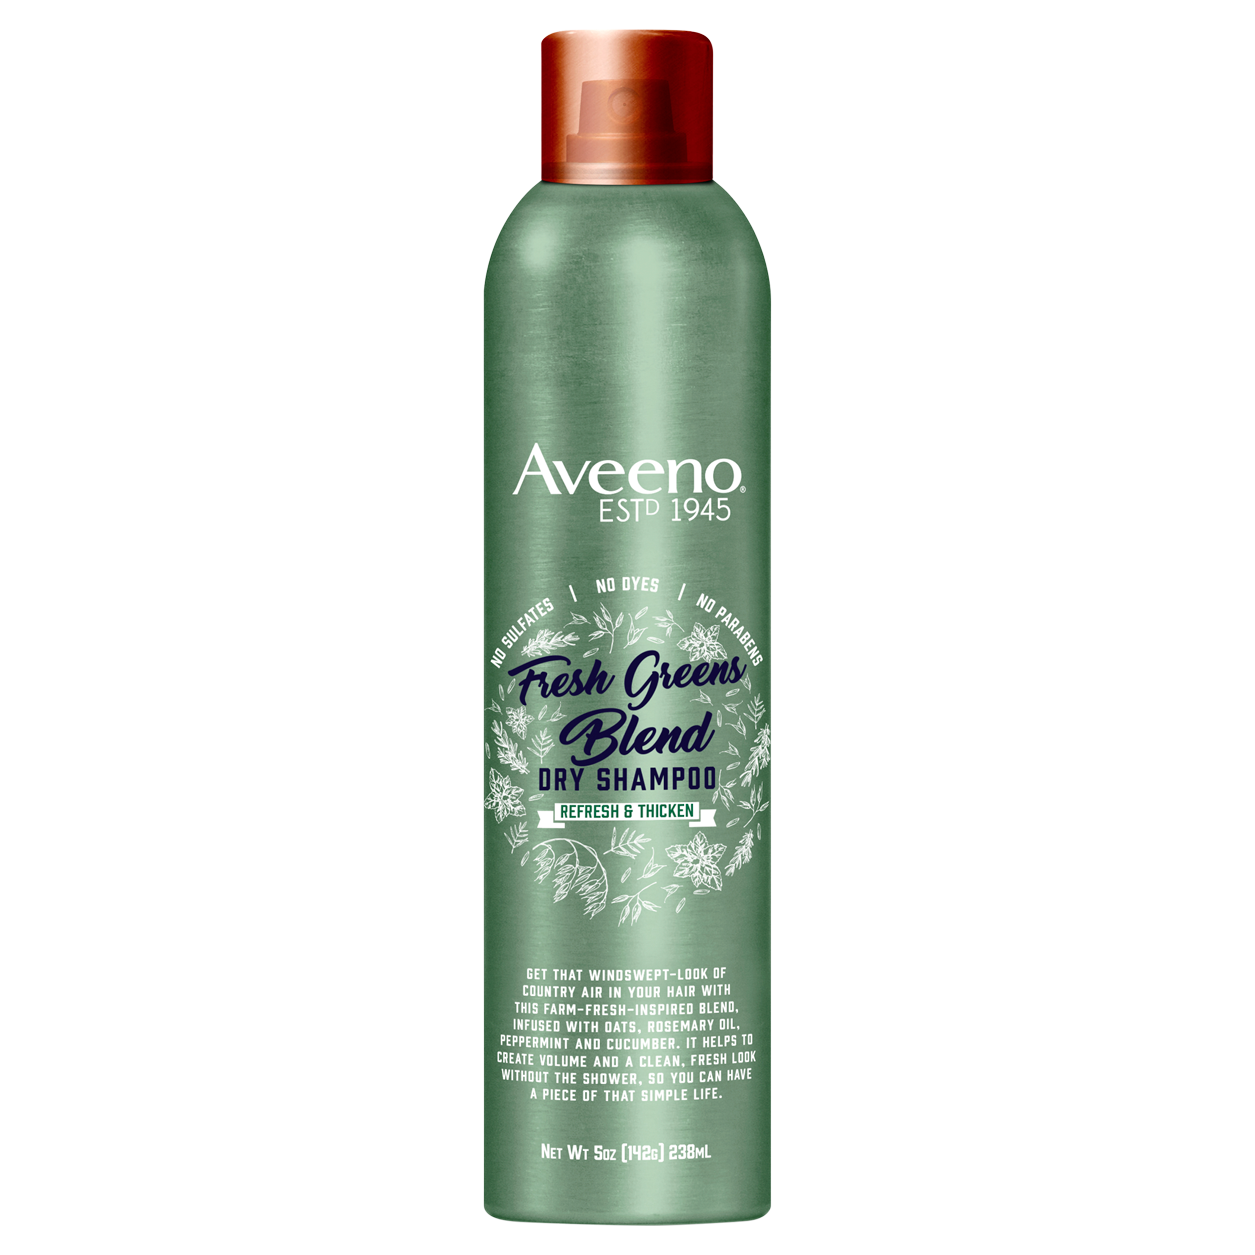 Aveeno-FreshGreens-DryShampoo